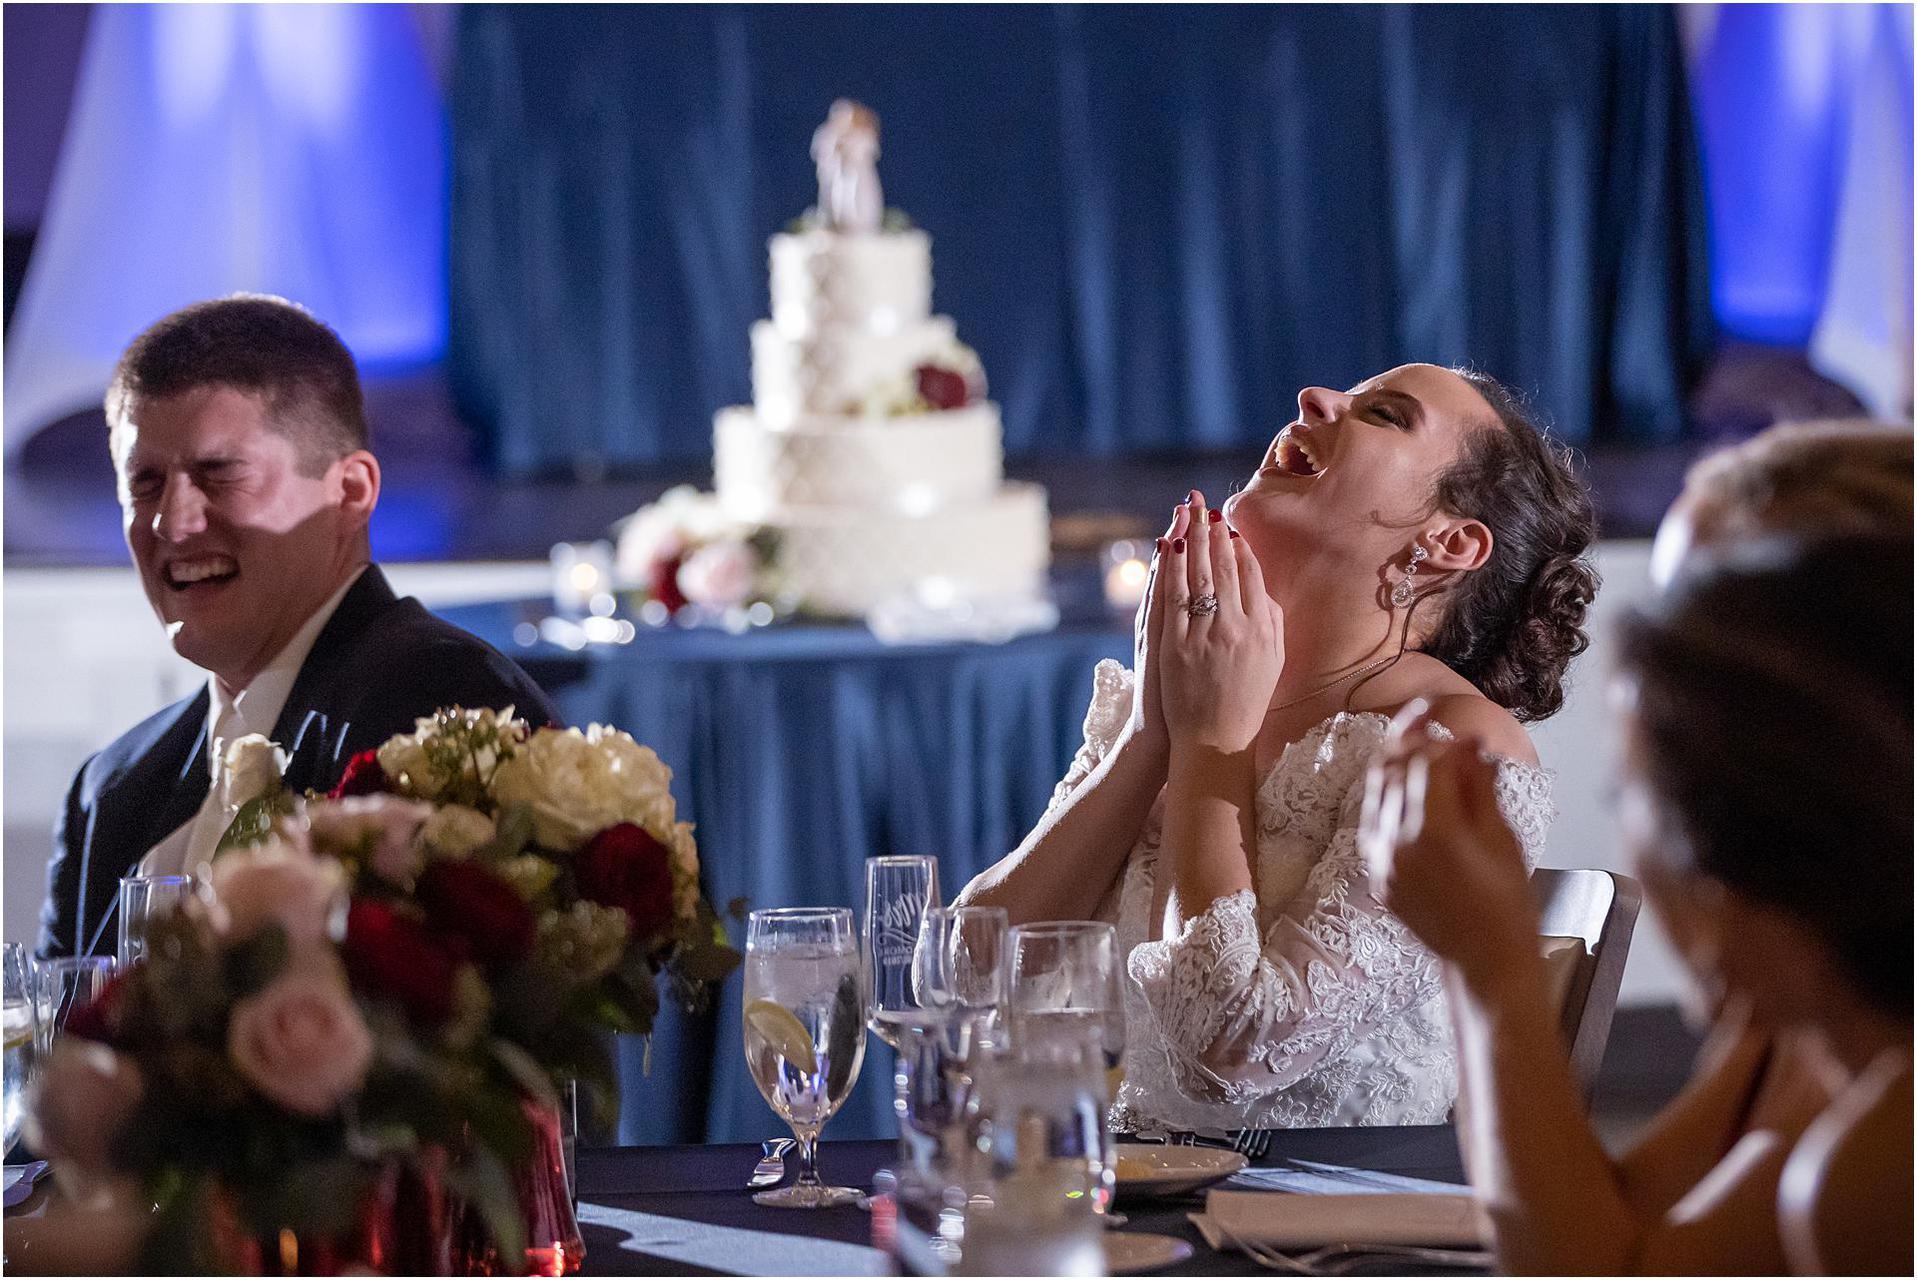 The Transept wedding reception bride toast